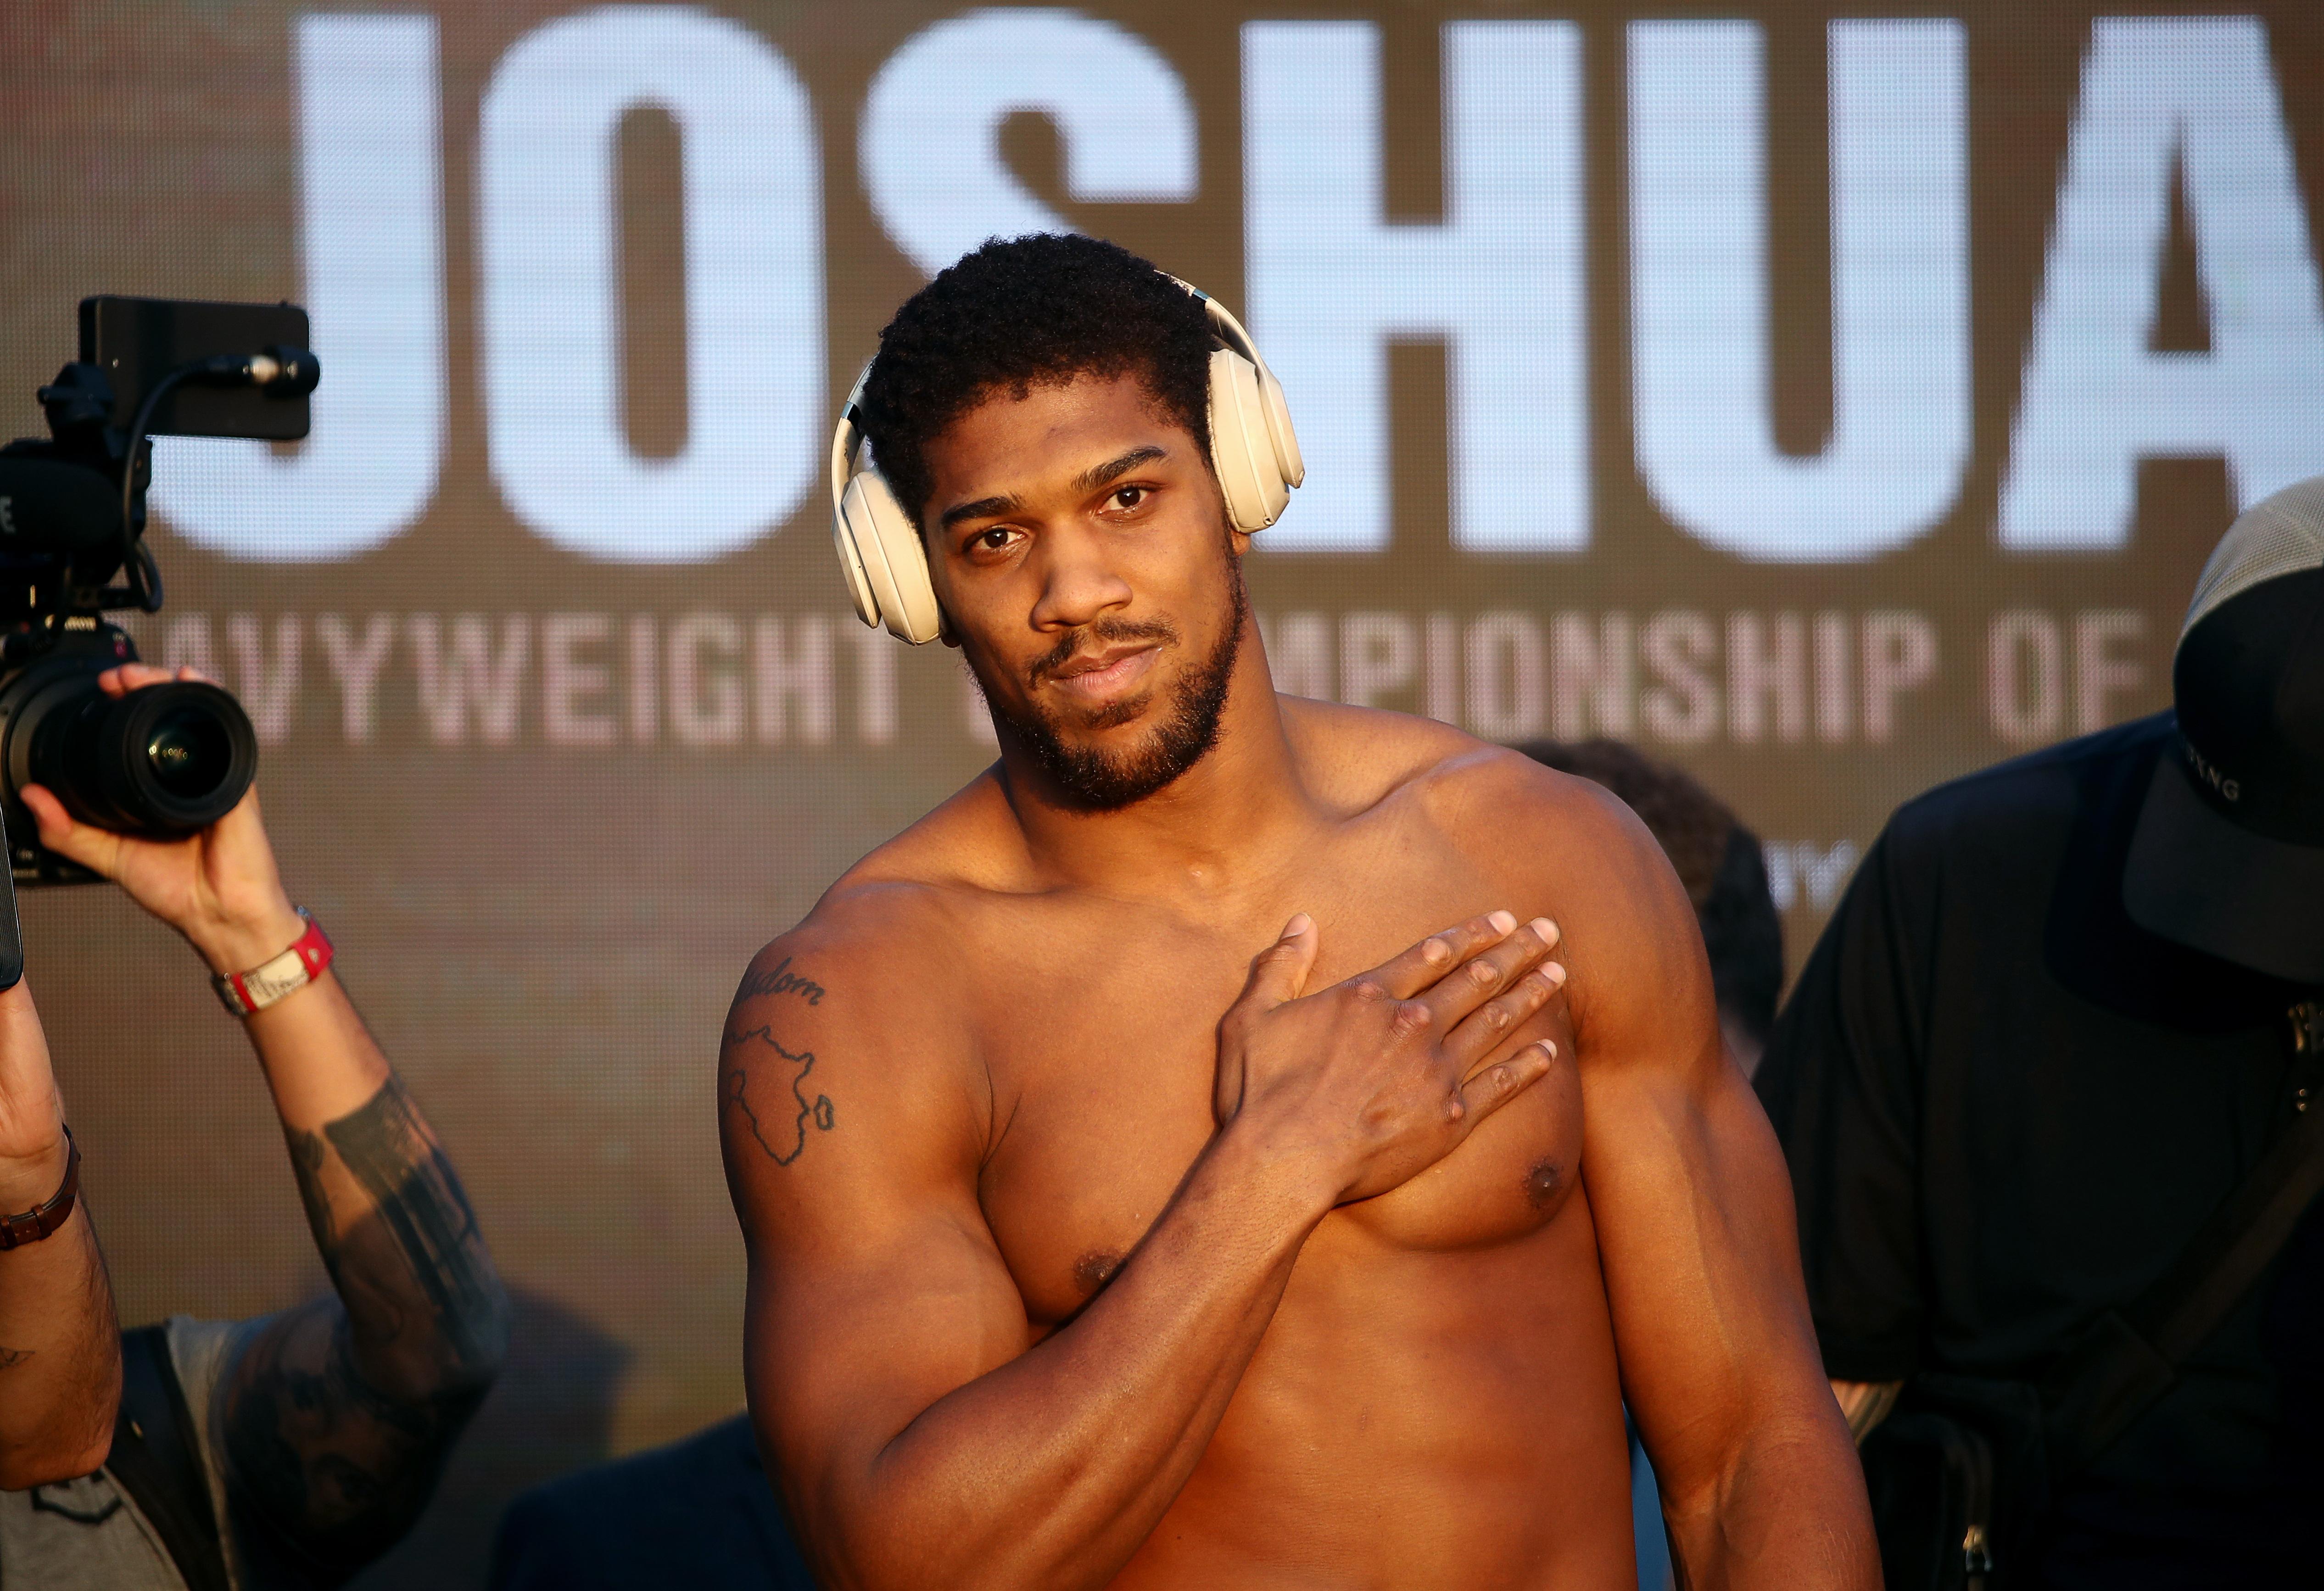 Weigh-in ceremony ahead of Ruiz vs Joshua